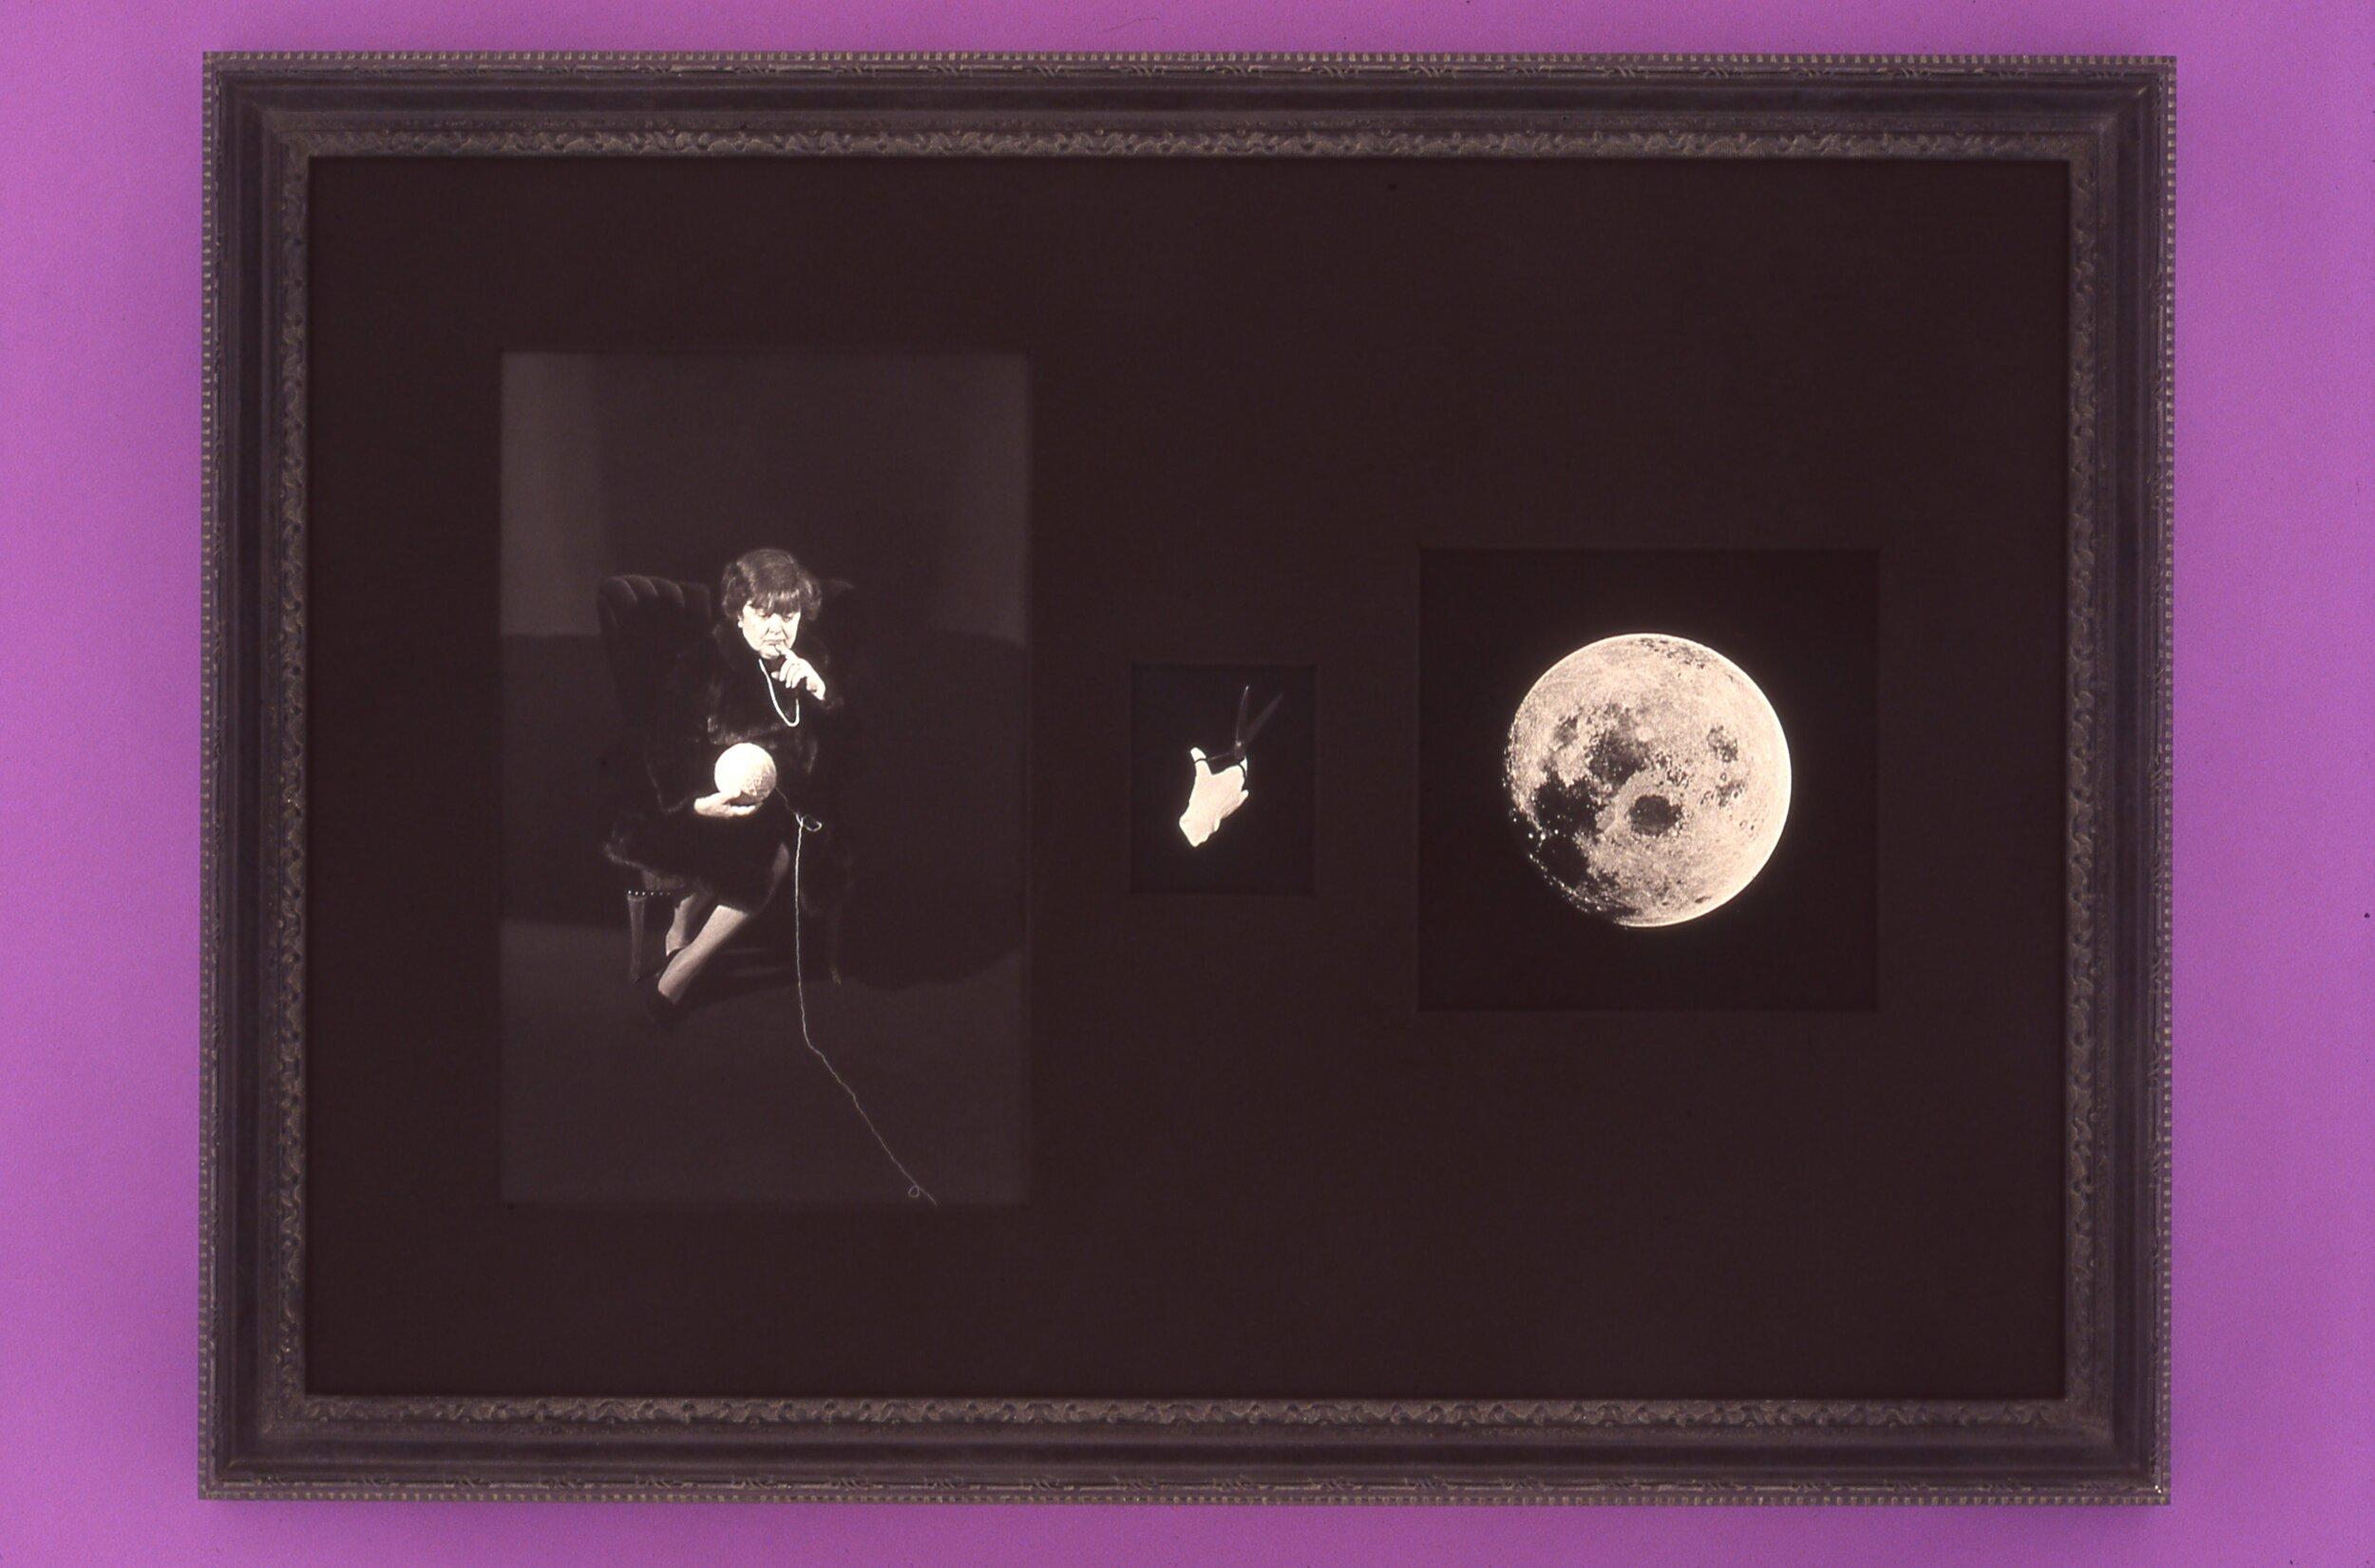 Portrait of the Artist's Mother, Marcella Montagna-Boskovich,  1998  Gelatin silver prints, gouache  40 x 31 1/2 inches